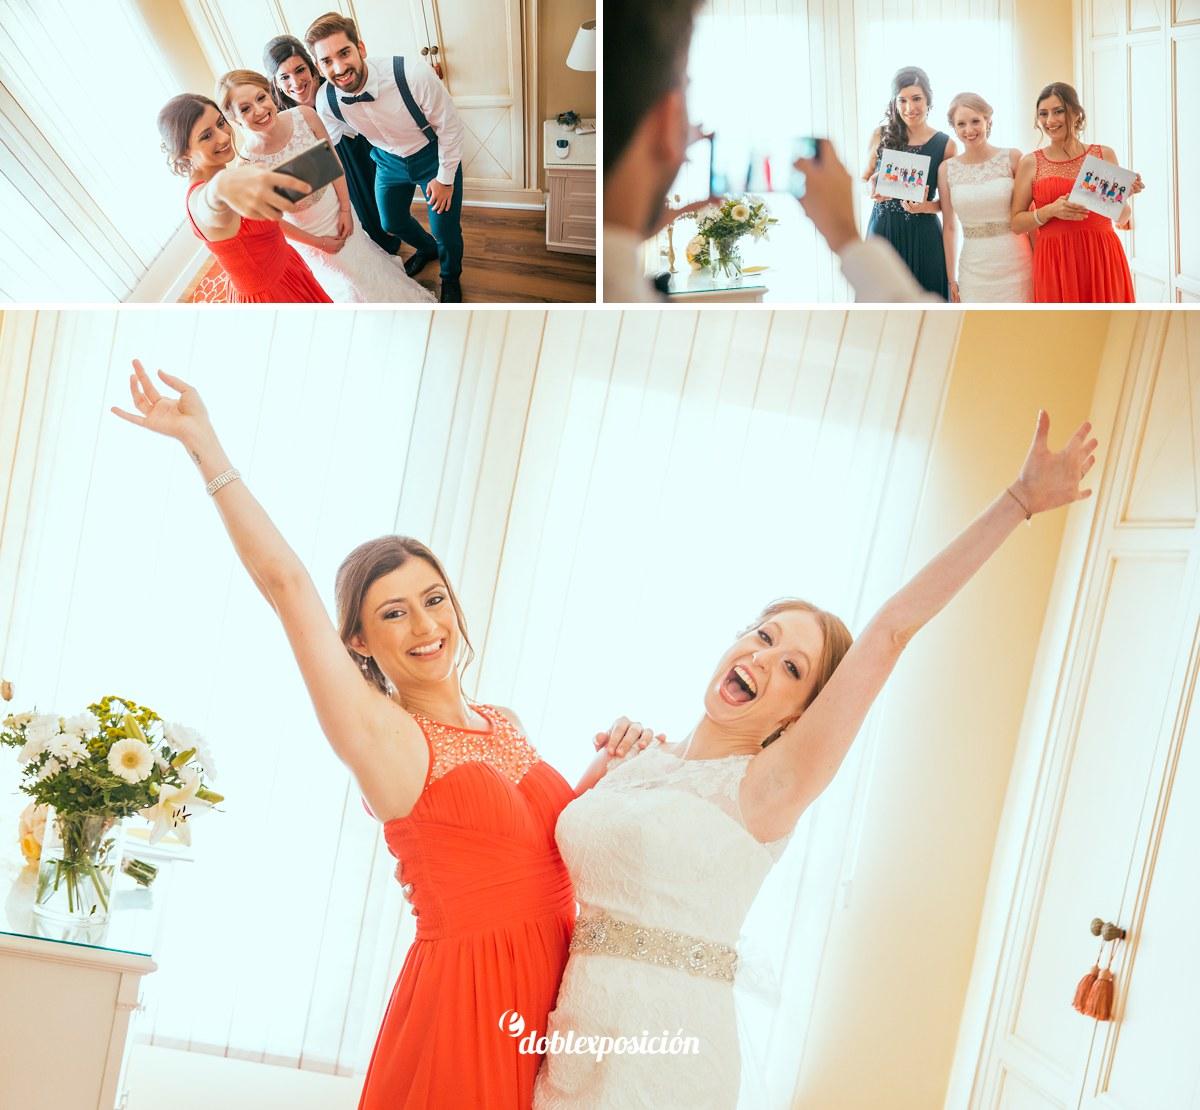 fotografos-boda-campo-masia-finca-el-lago-elche-alicante_0011